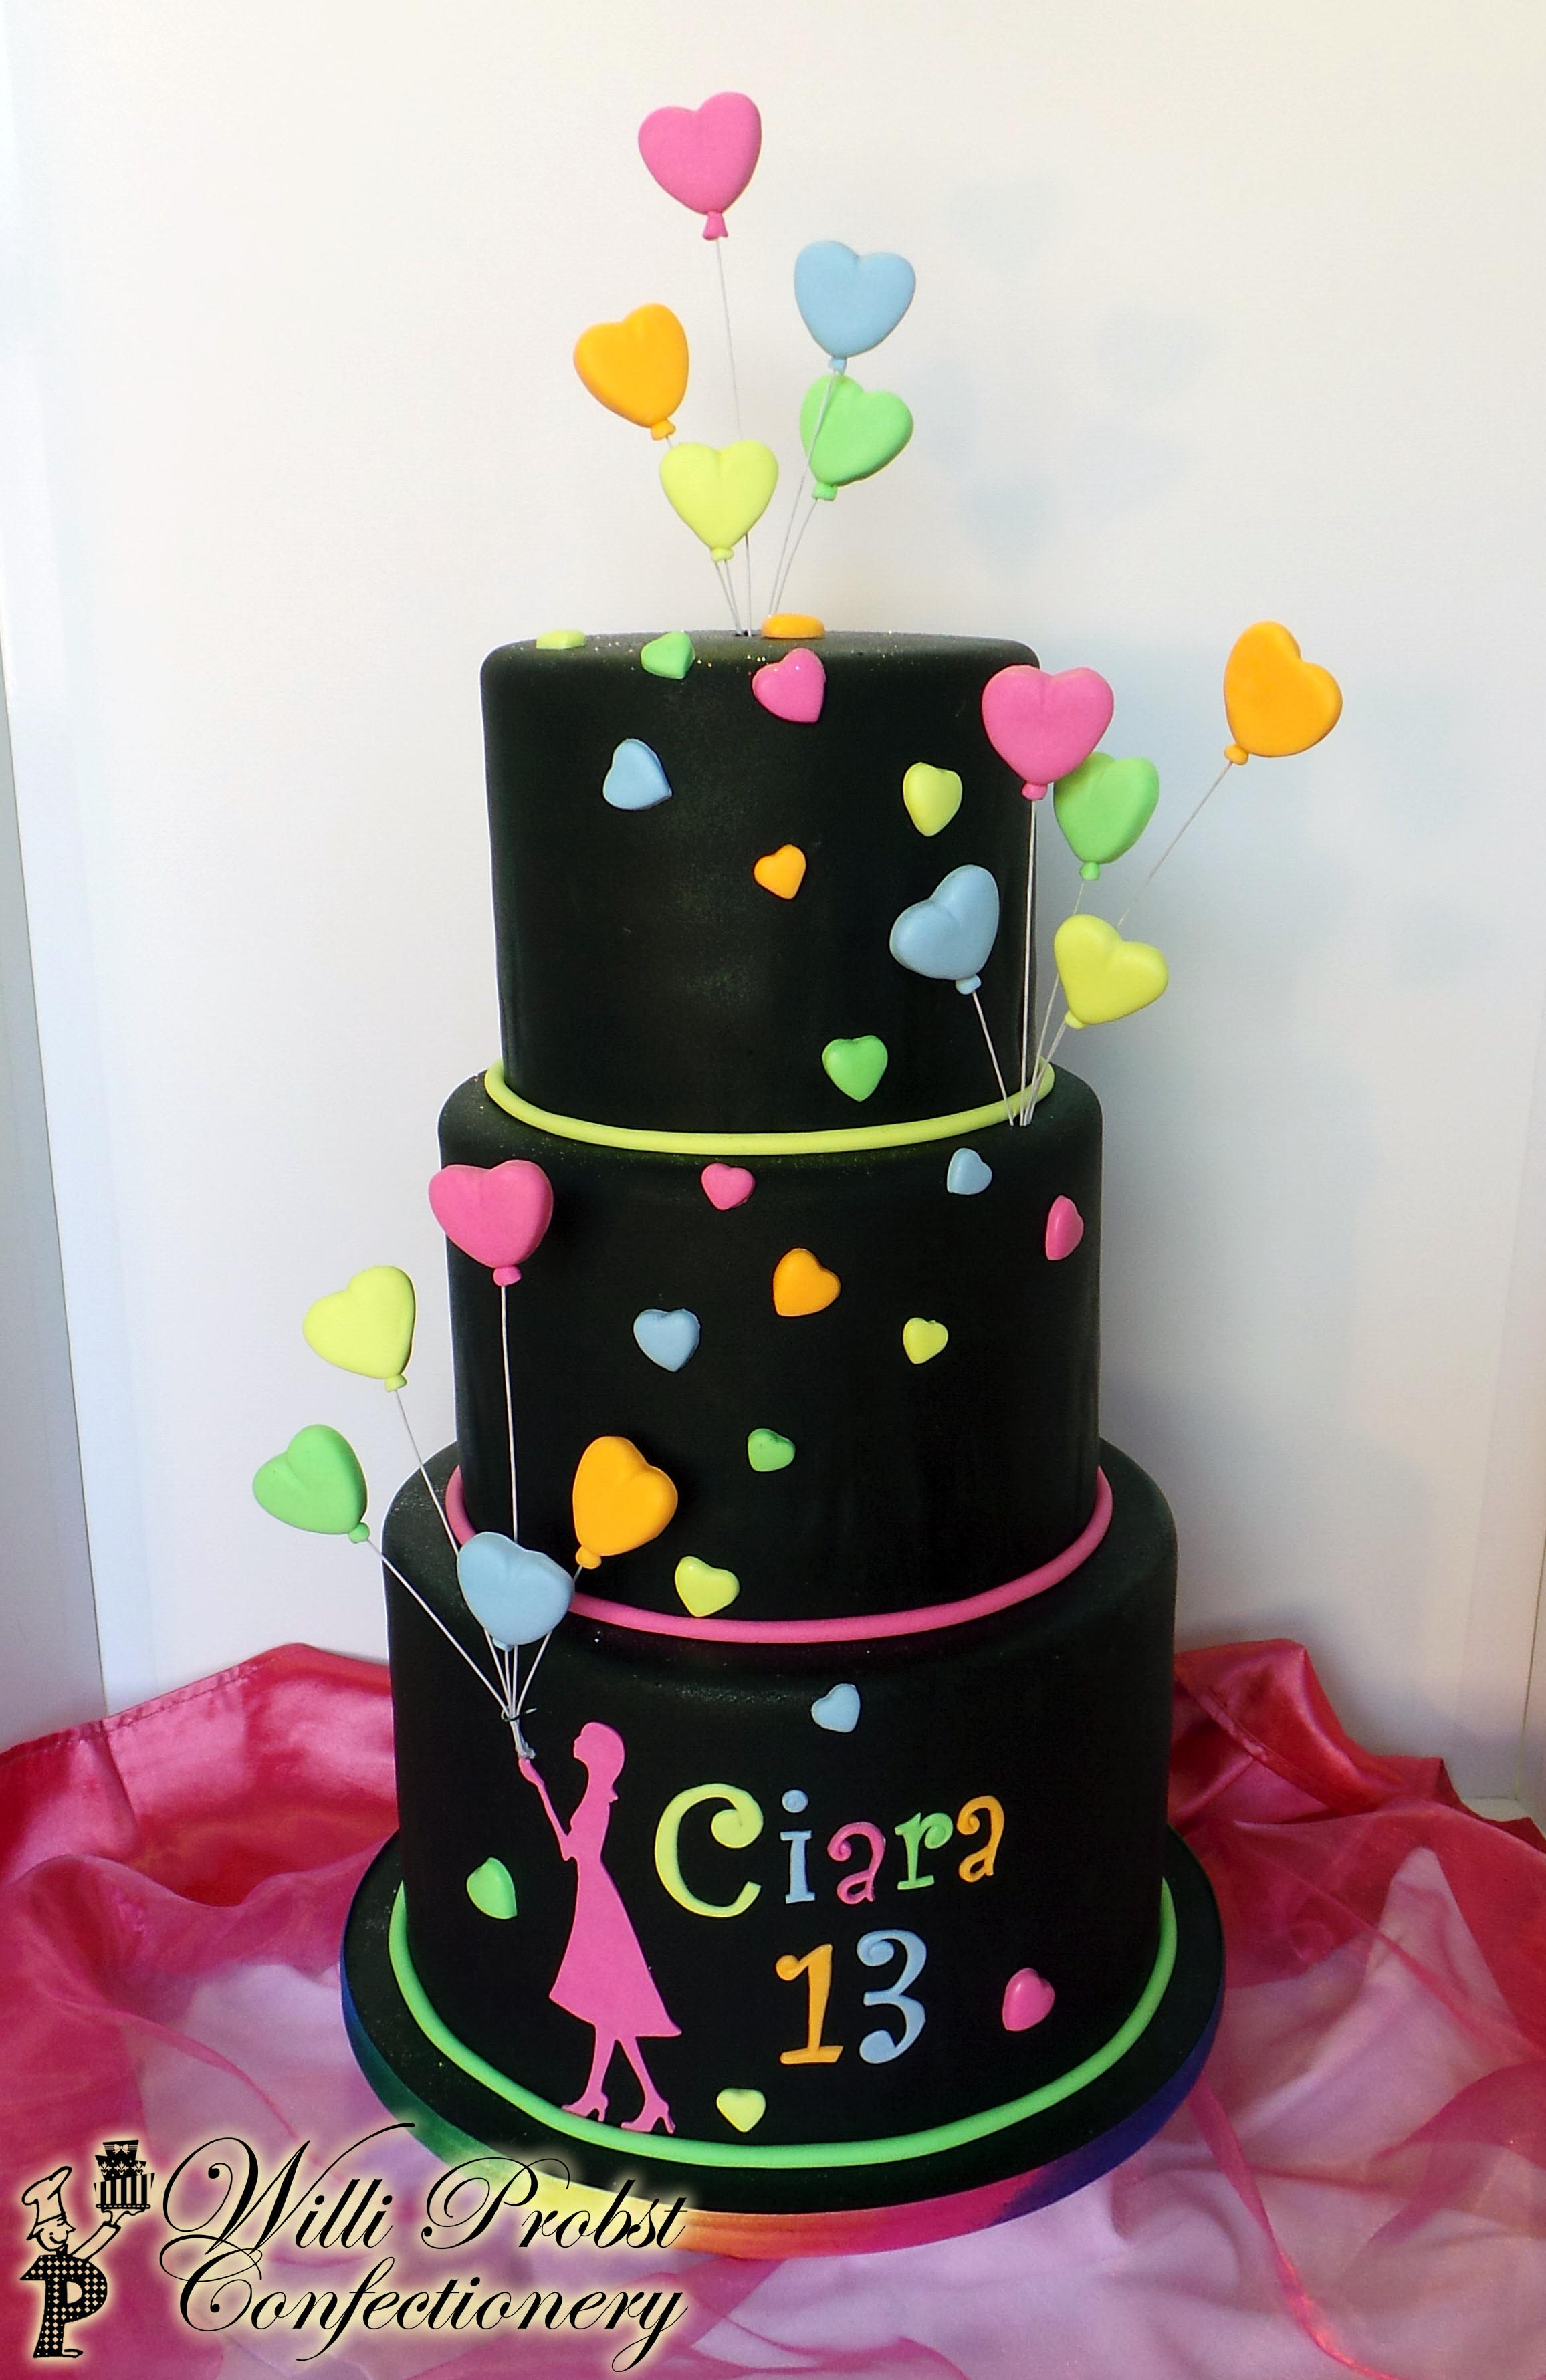 Magnificent 13 Neon Colored Birthday Cakes Photo Neon Zebra Print Cake Birthday Cards Printable Riciscafe Filternl